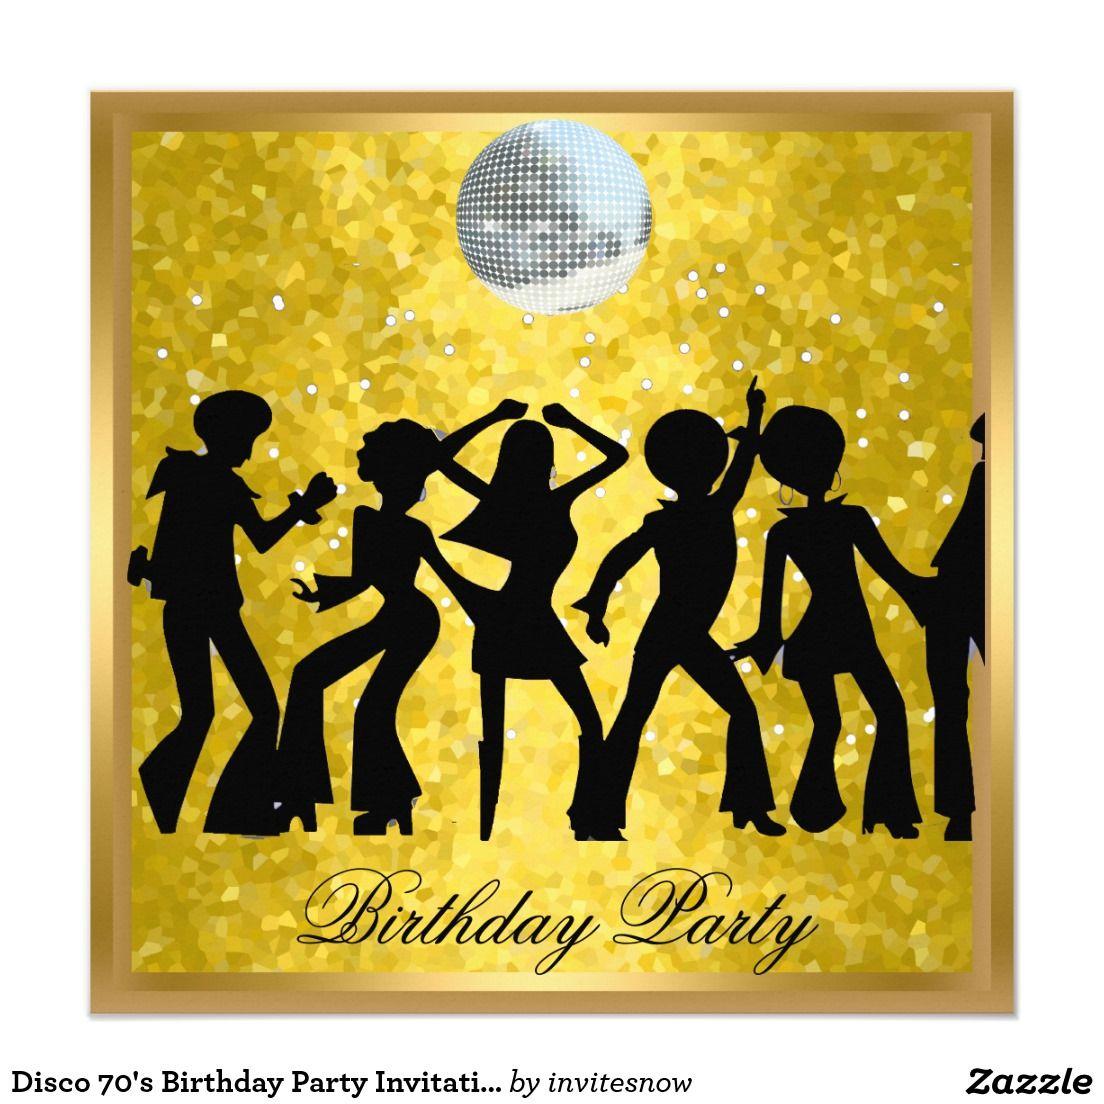 Disco 70's Birthday Party Invitation Retro | Party invitations ...